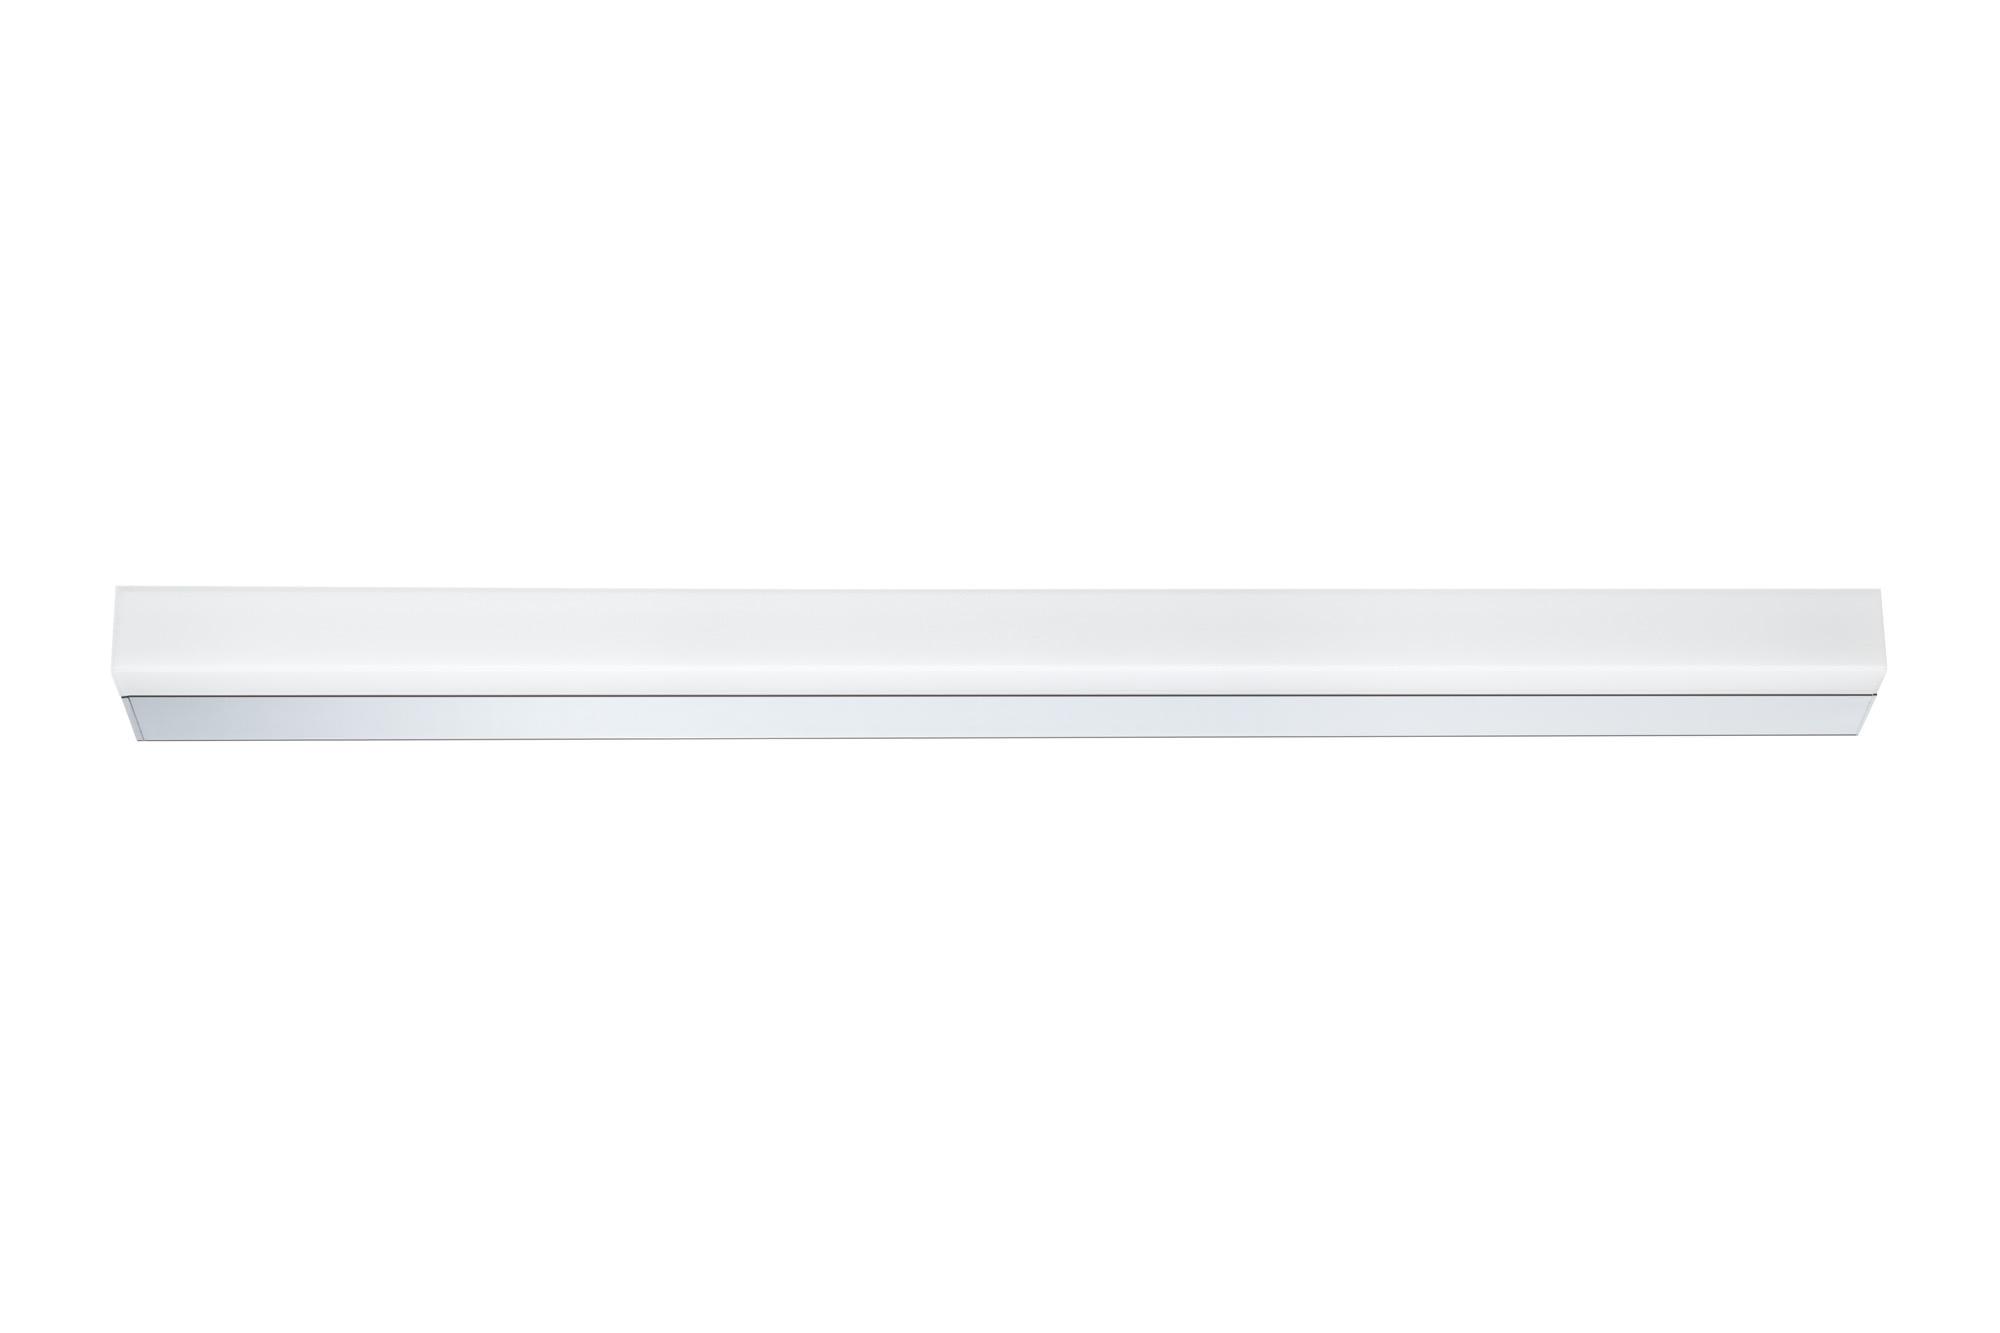 Paulmann. 70420 Светильник настенно-потолочный Linea 60 IP44 11W LED, хром